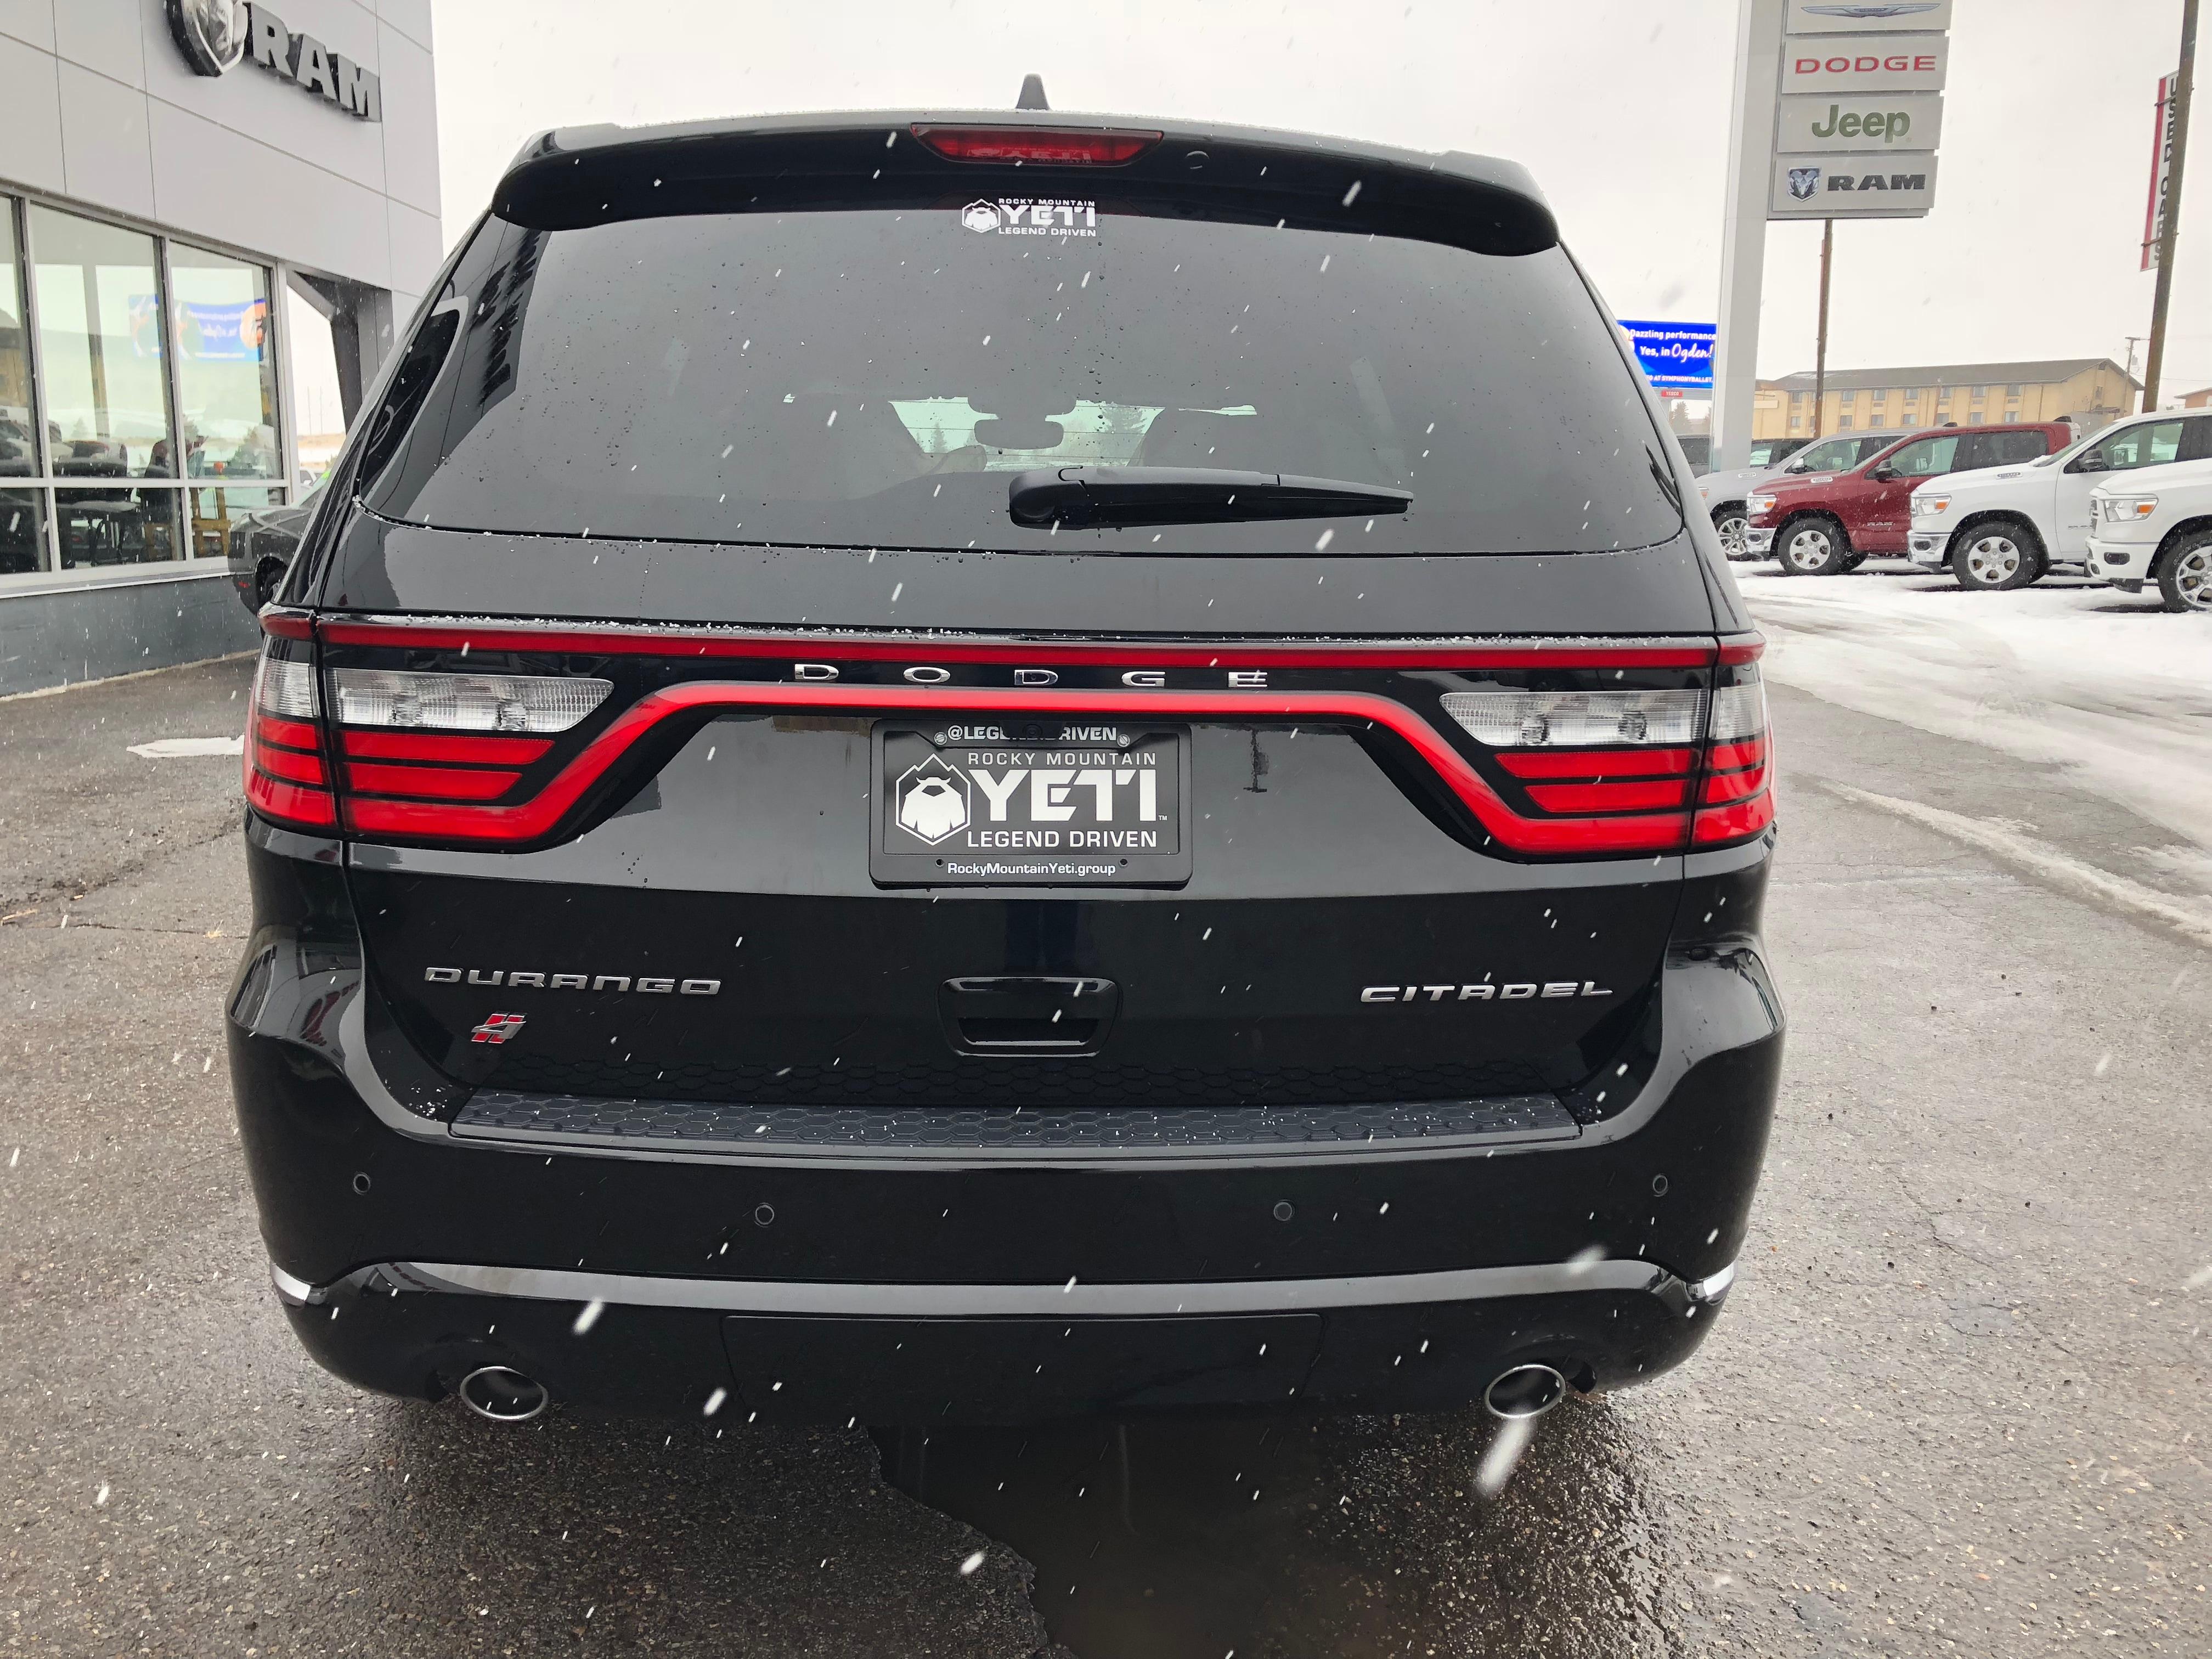 New 2018 Dodge Durango For Sale at Rocky Mountain Yeti